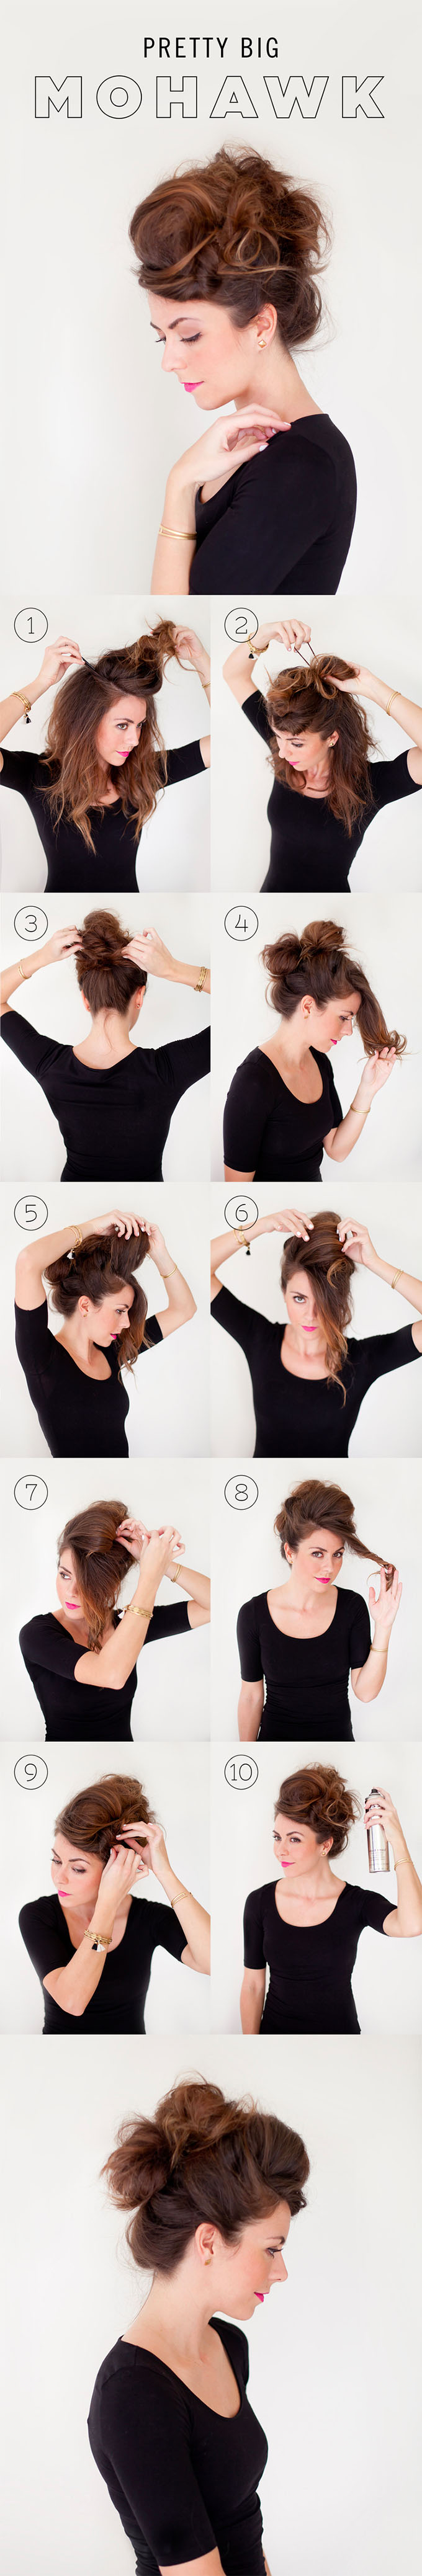 Halloween hairstyles - big mohawk hair tutorial